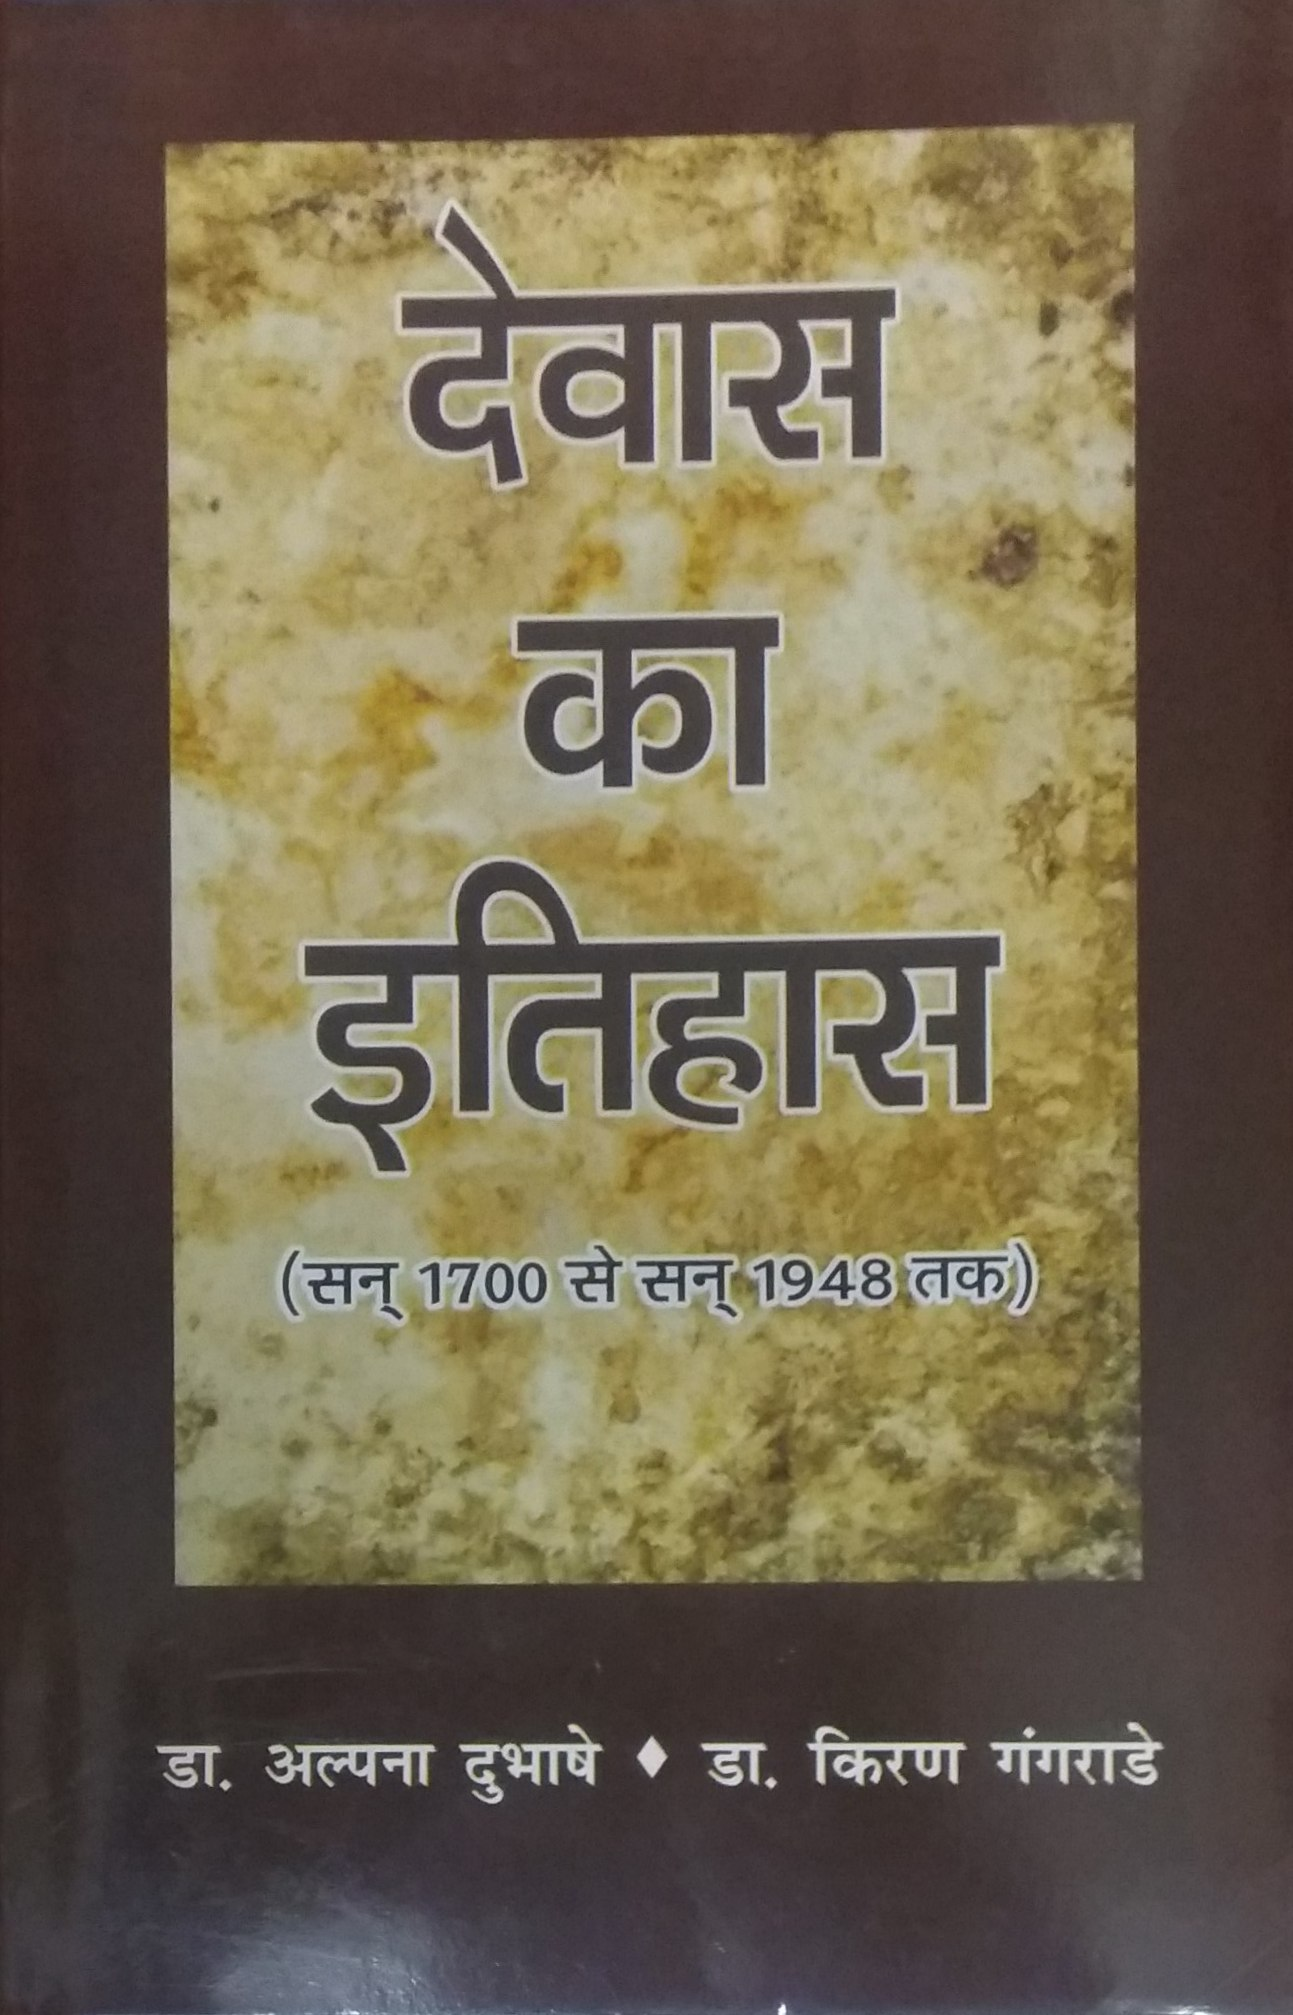 Dewas ka Itihas (1700 se 1948 Tak) (Hindi)